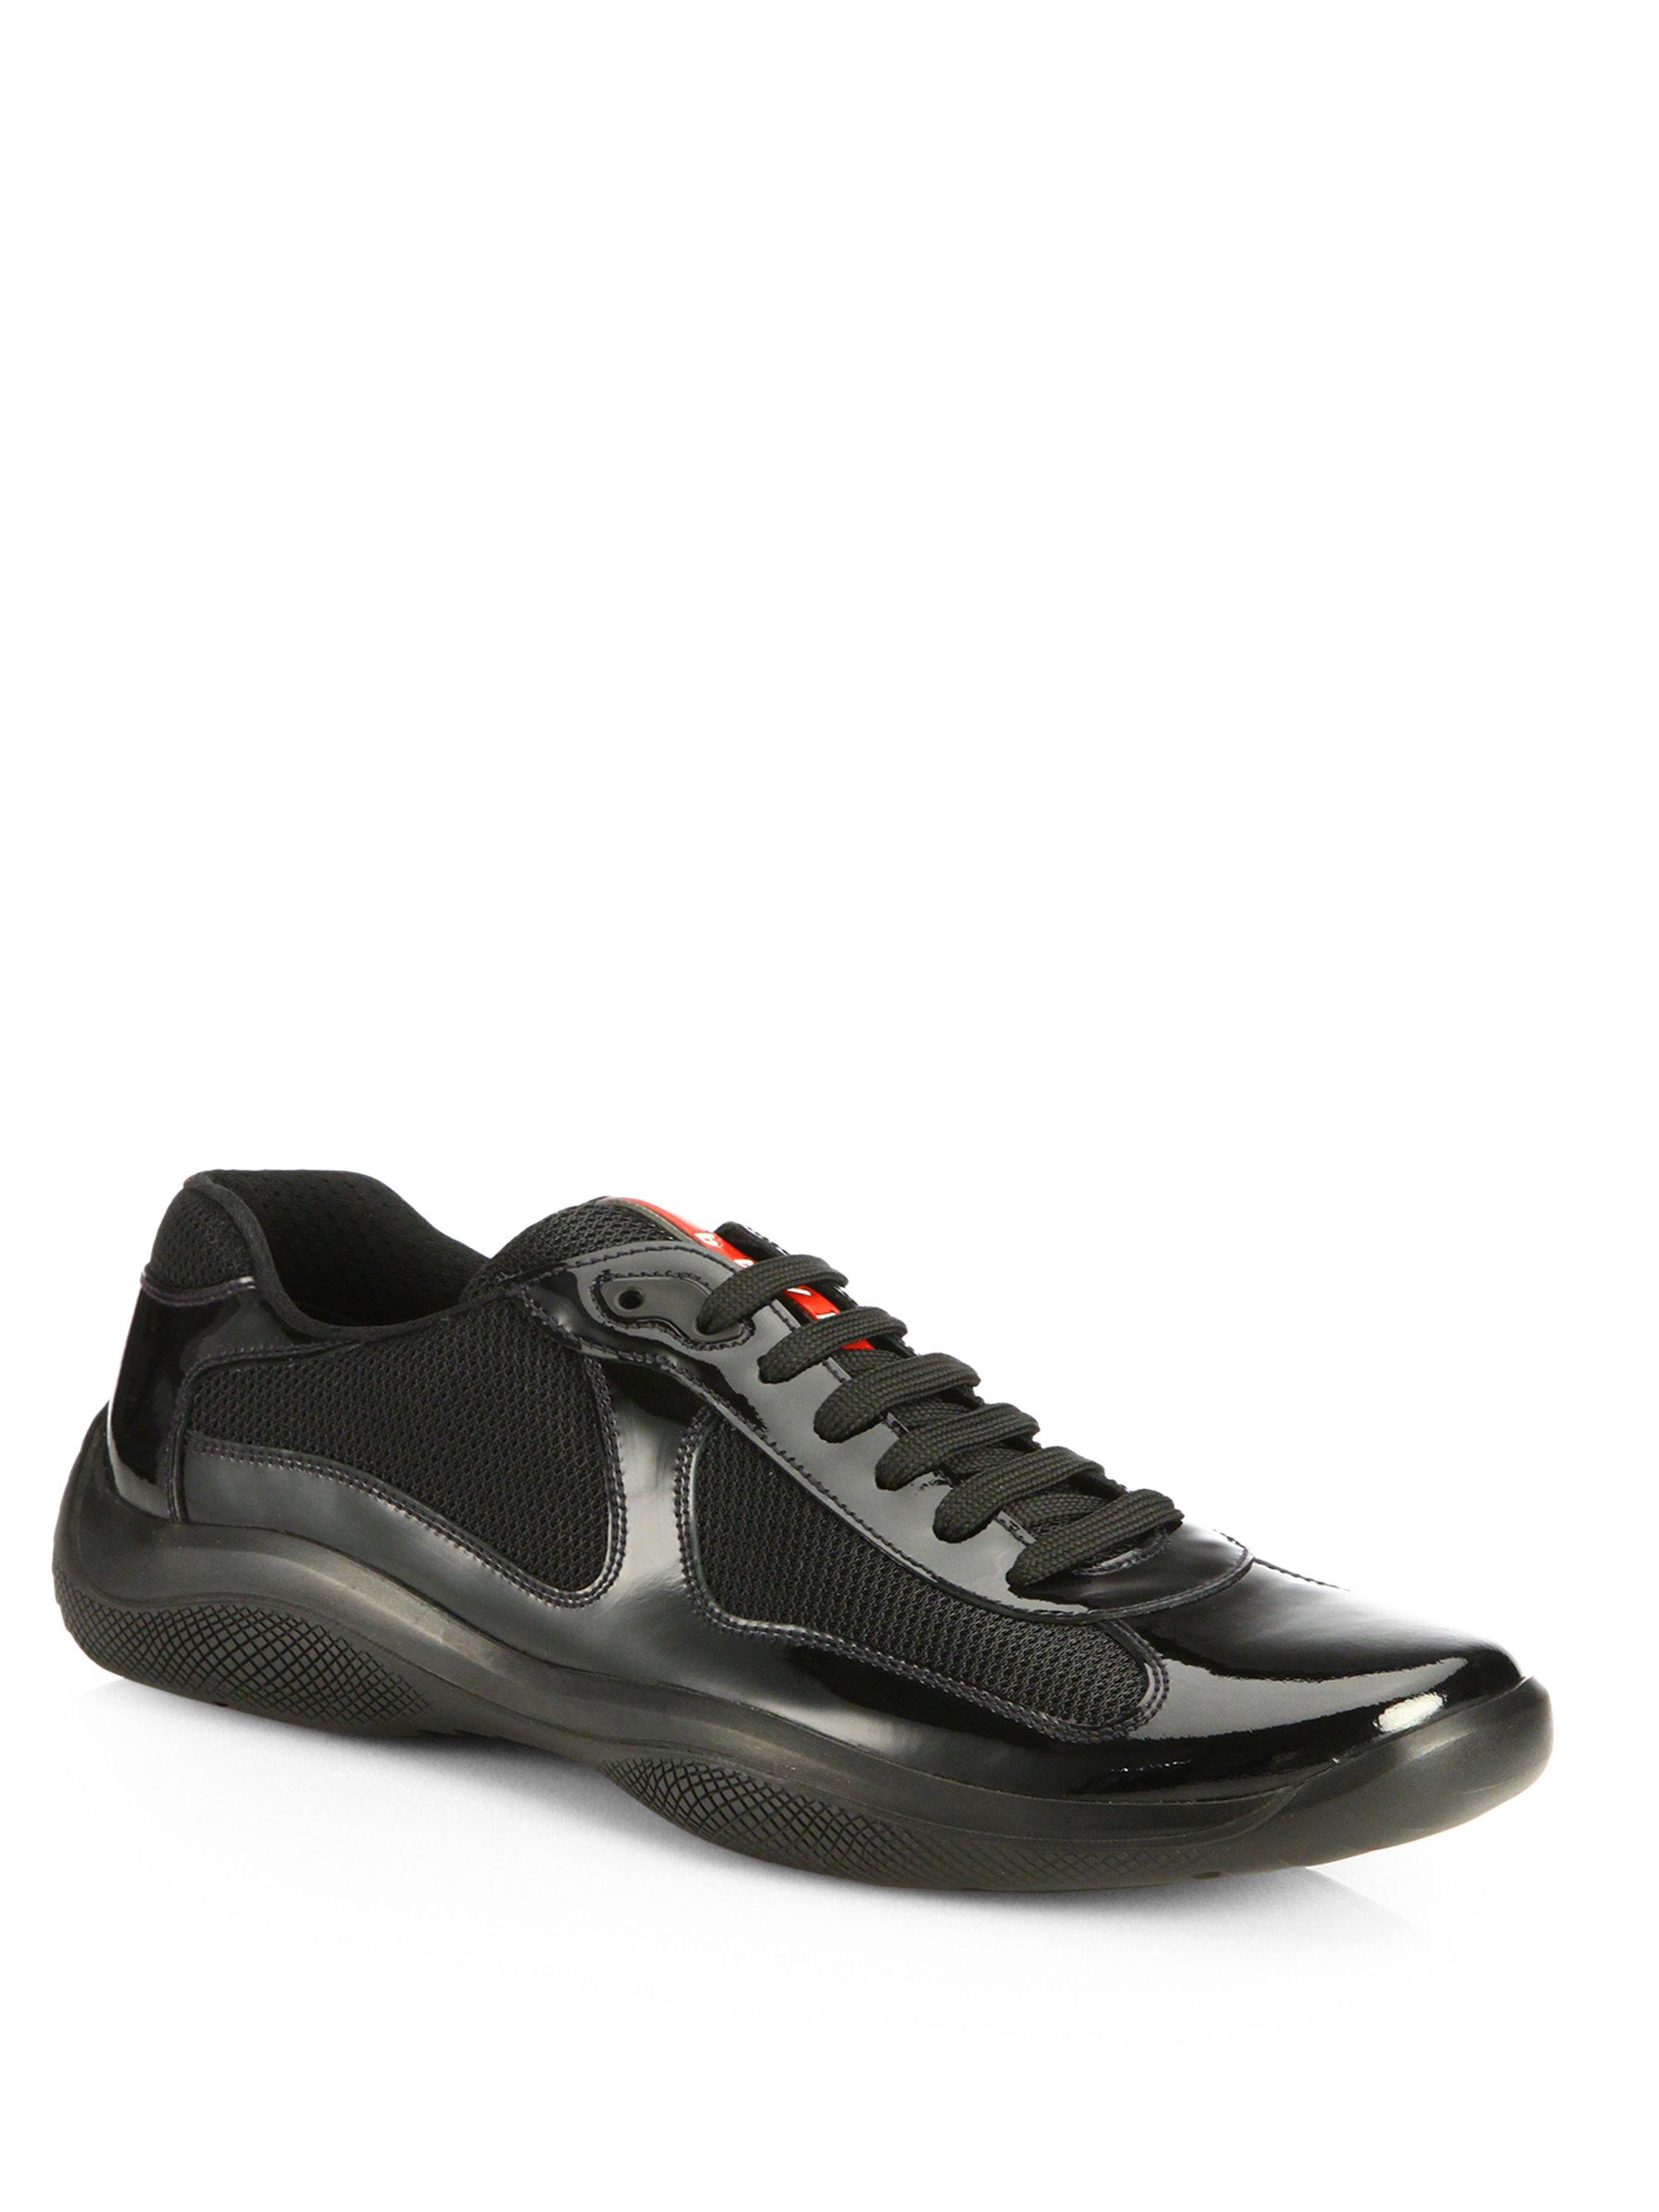 e7330dbb3155c shopping prada new americas cup leather high top sneakers 8adab 92b4d  hot lyst  prada patent americas cup sneakers in black for men d9605 4733e